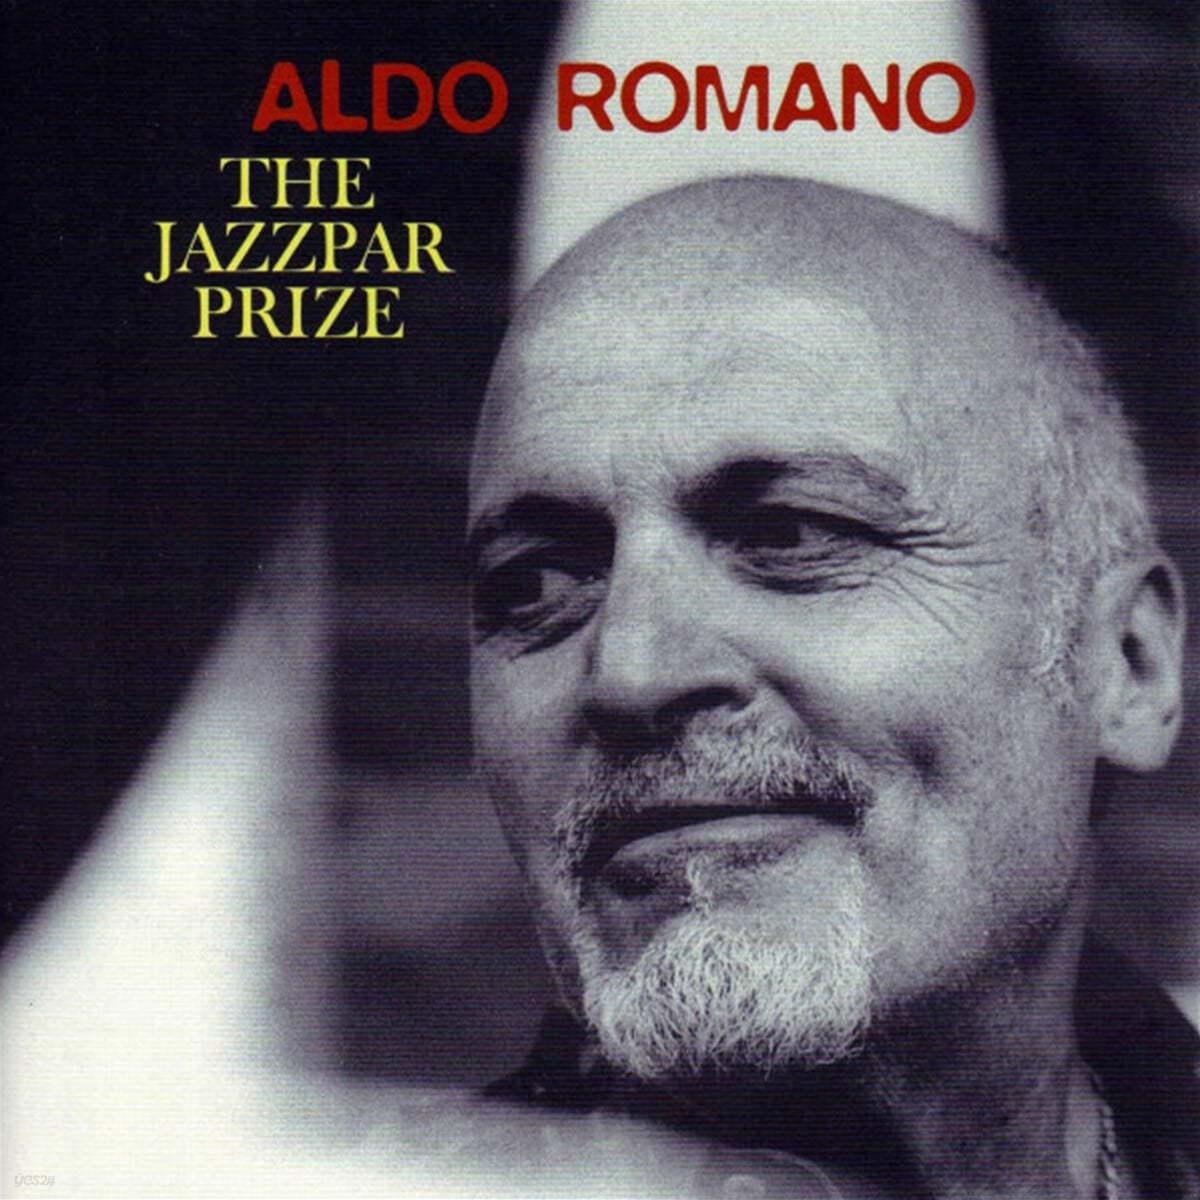 Aldo Romano (알도 로마노) - The Jazzpar Prize